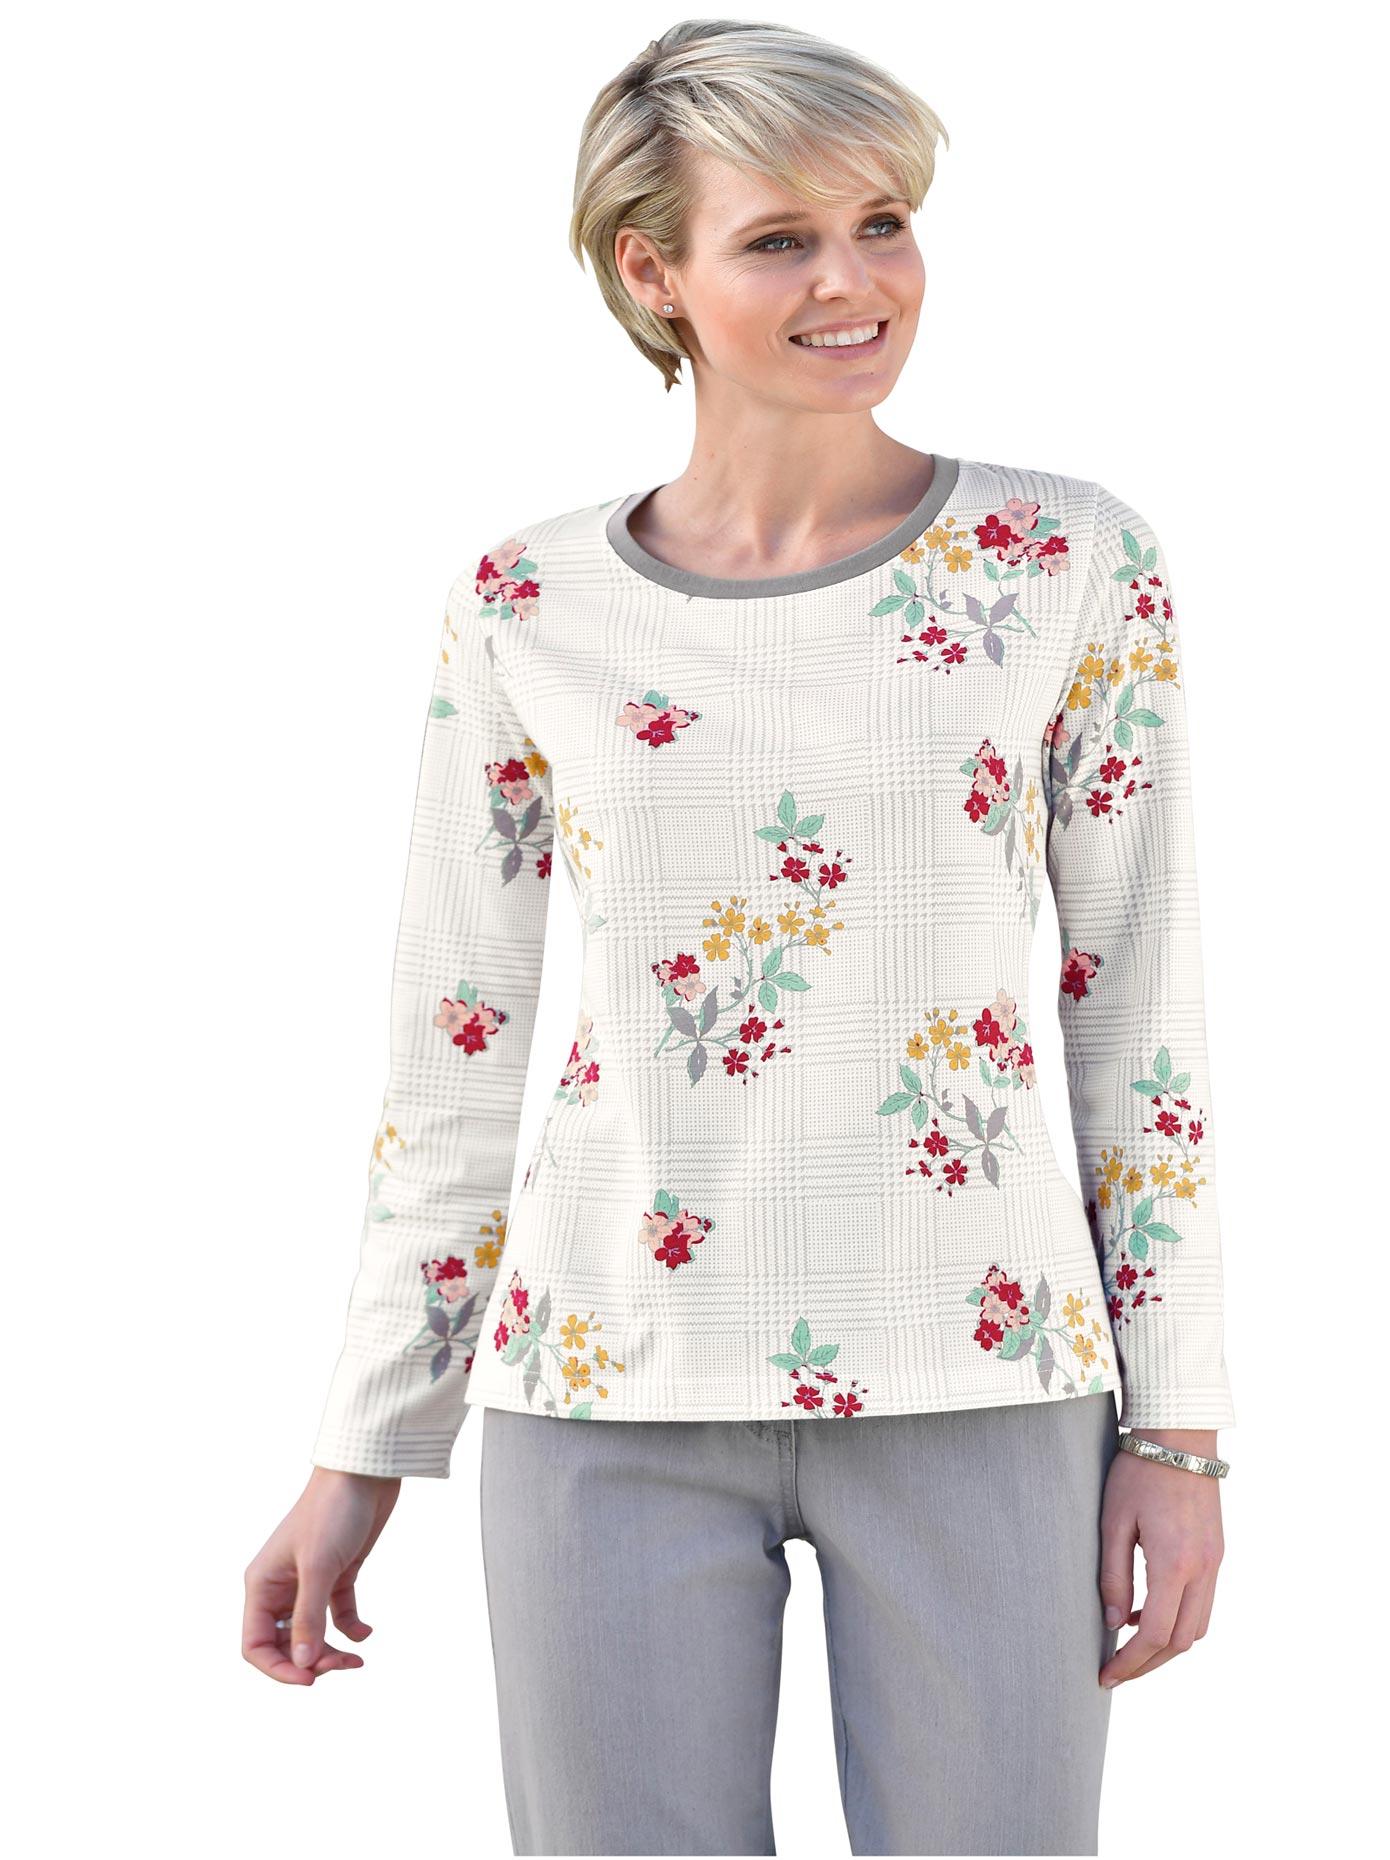 classic basics - Shirt mit floralem Druck